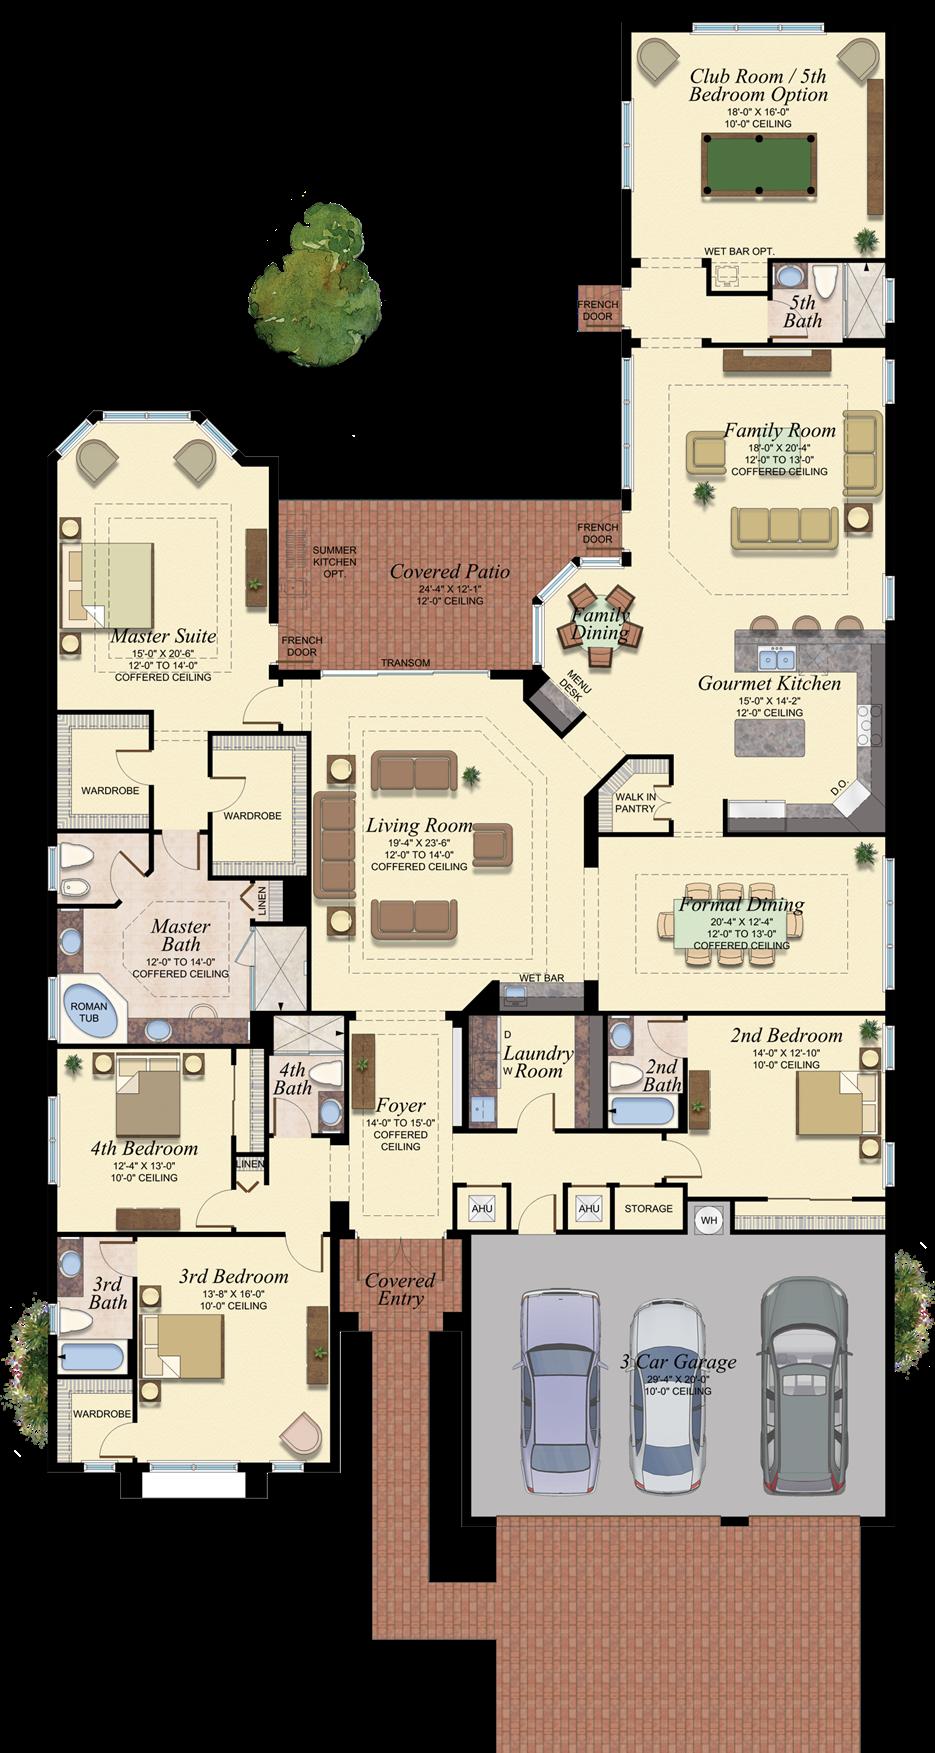 Charleston Grande 757 Floor Plan Ideas For The House